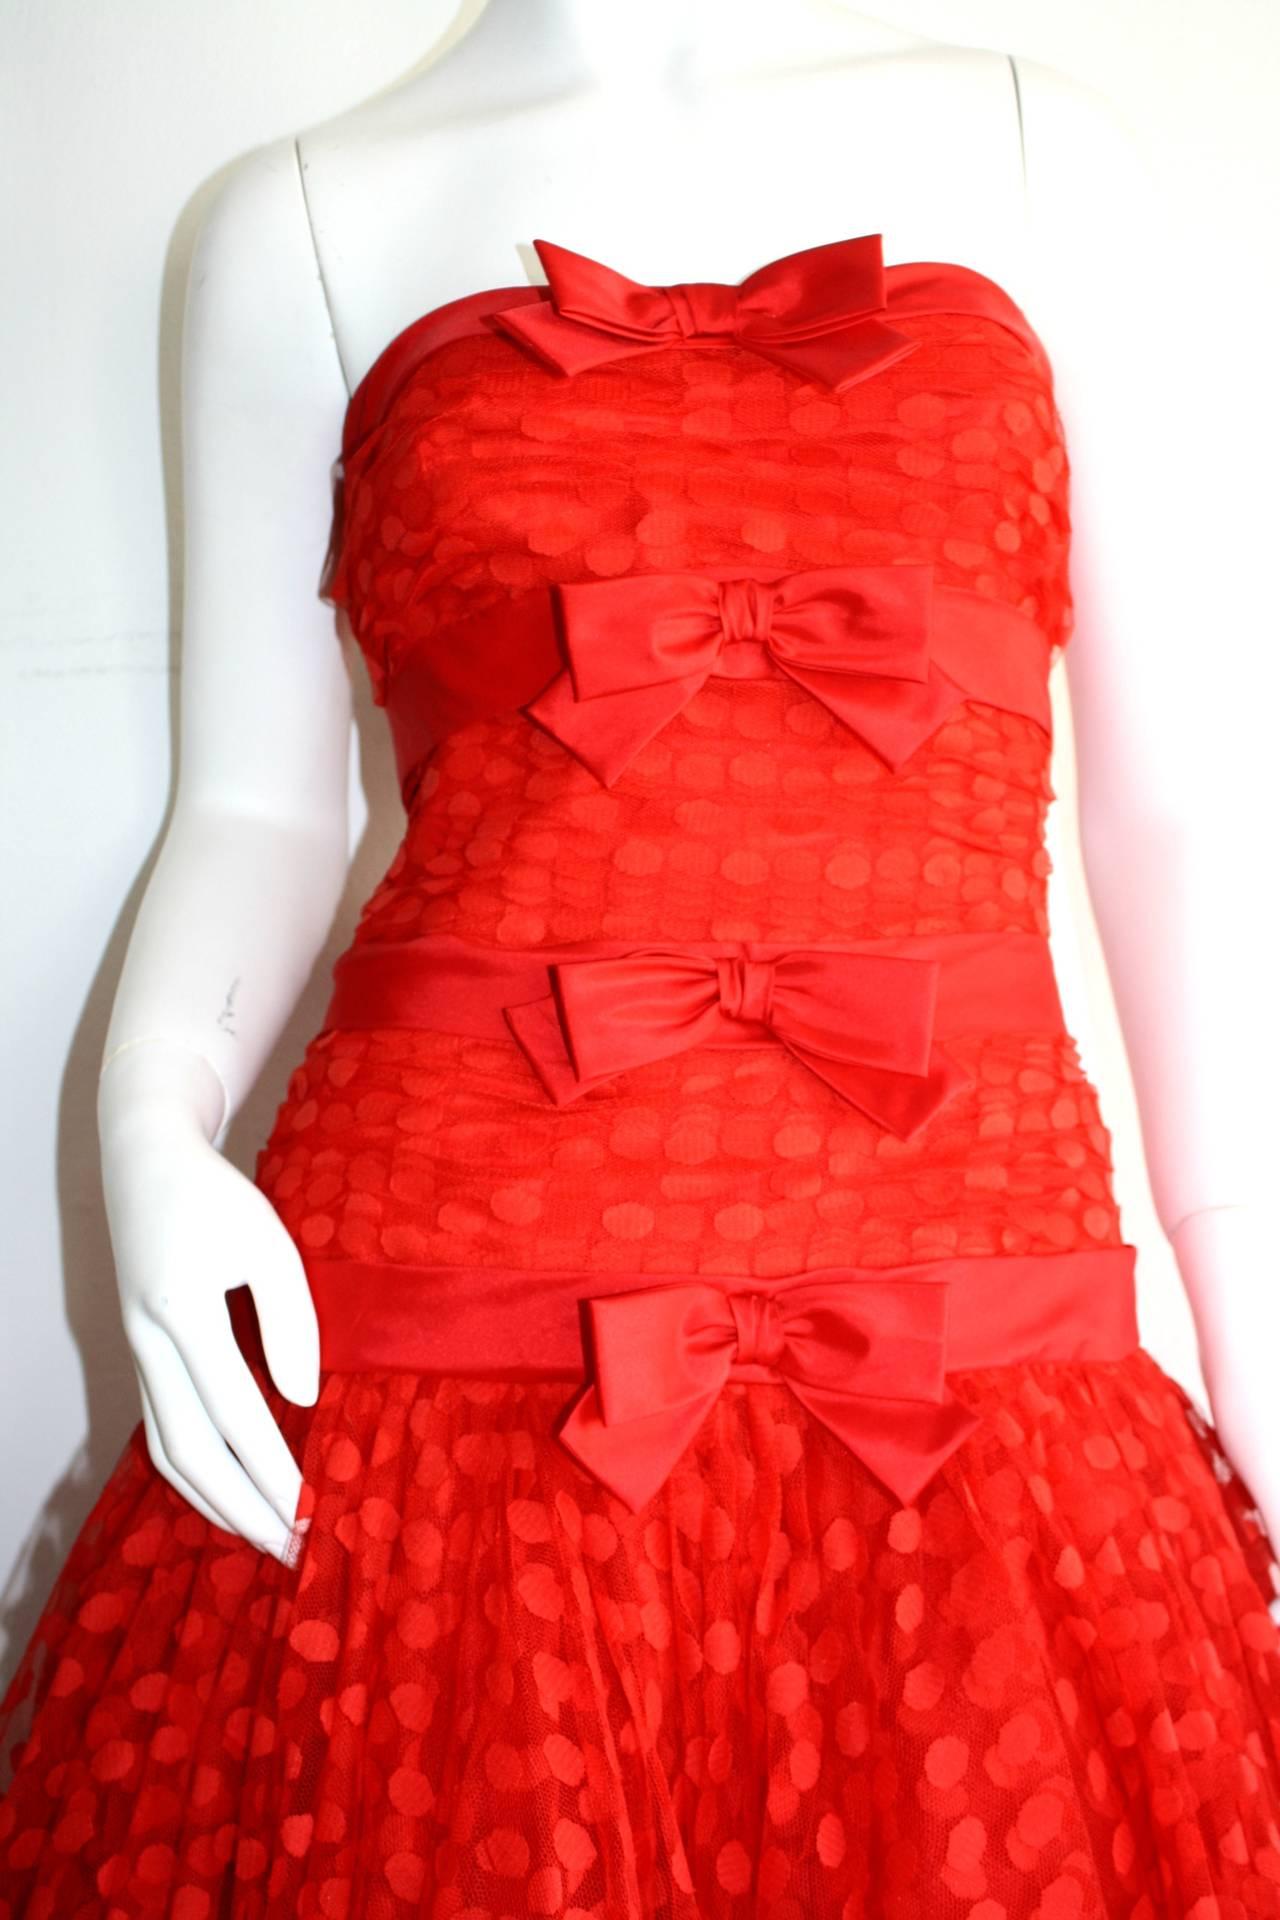 Incredible Vintage Jill Richards for Elizabeth Arden Red Valentine's Day Dress 4